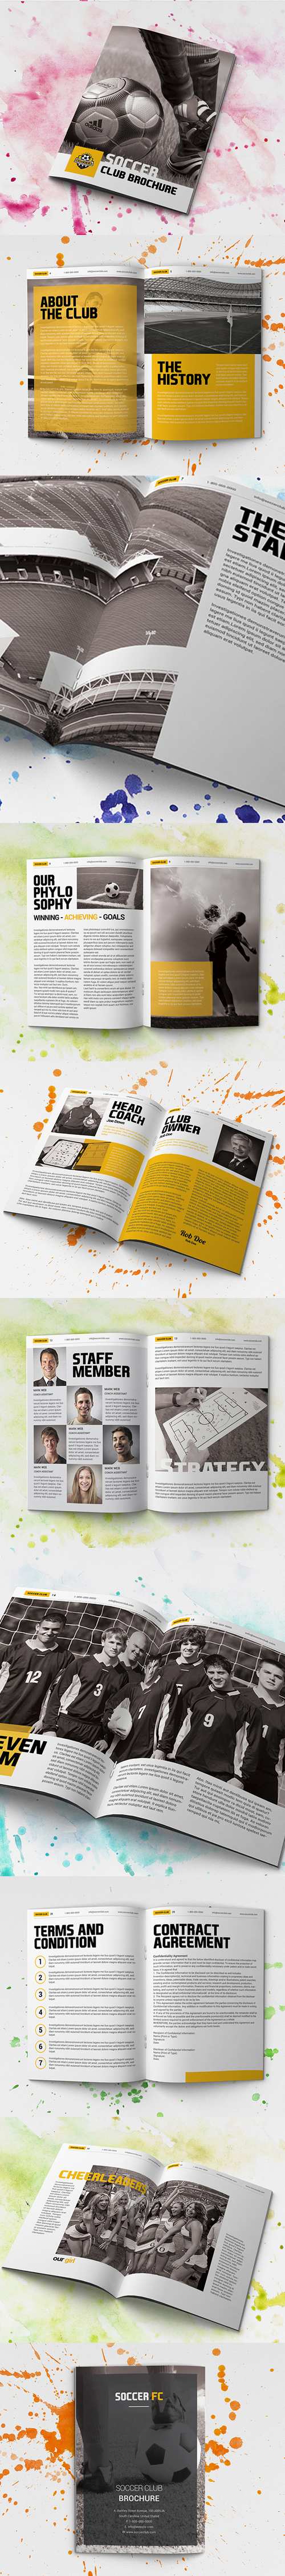 Soccer Club Brochure - Corporate Brochures